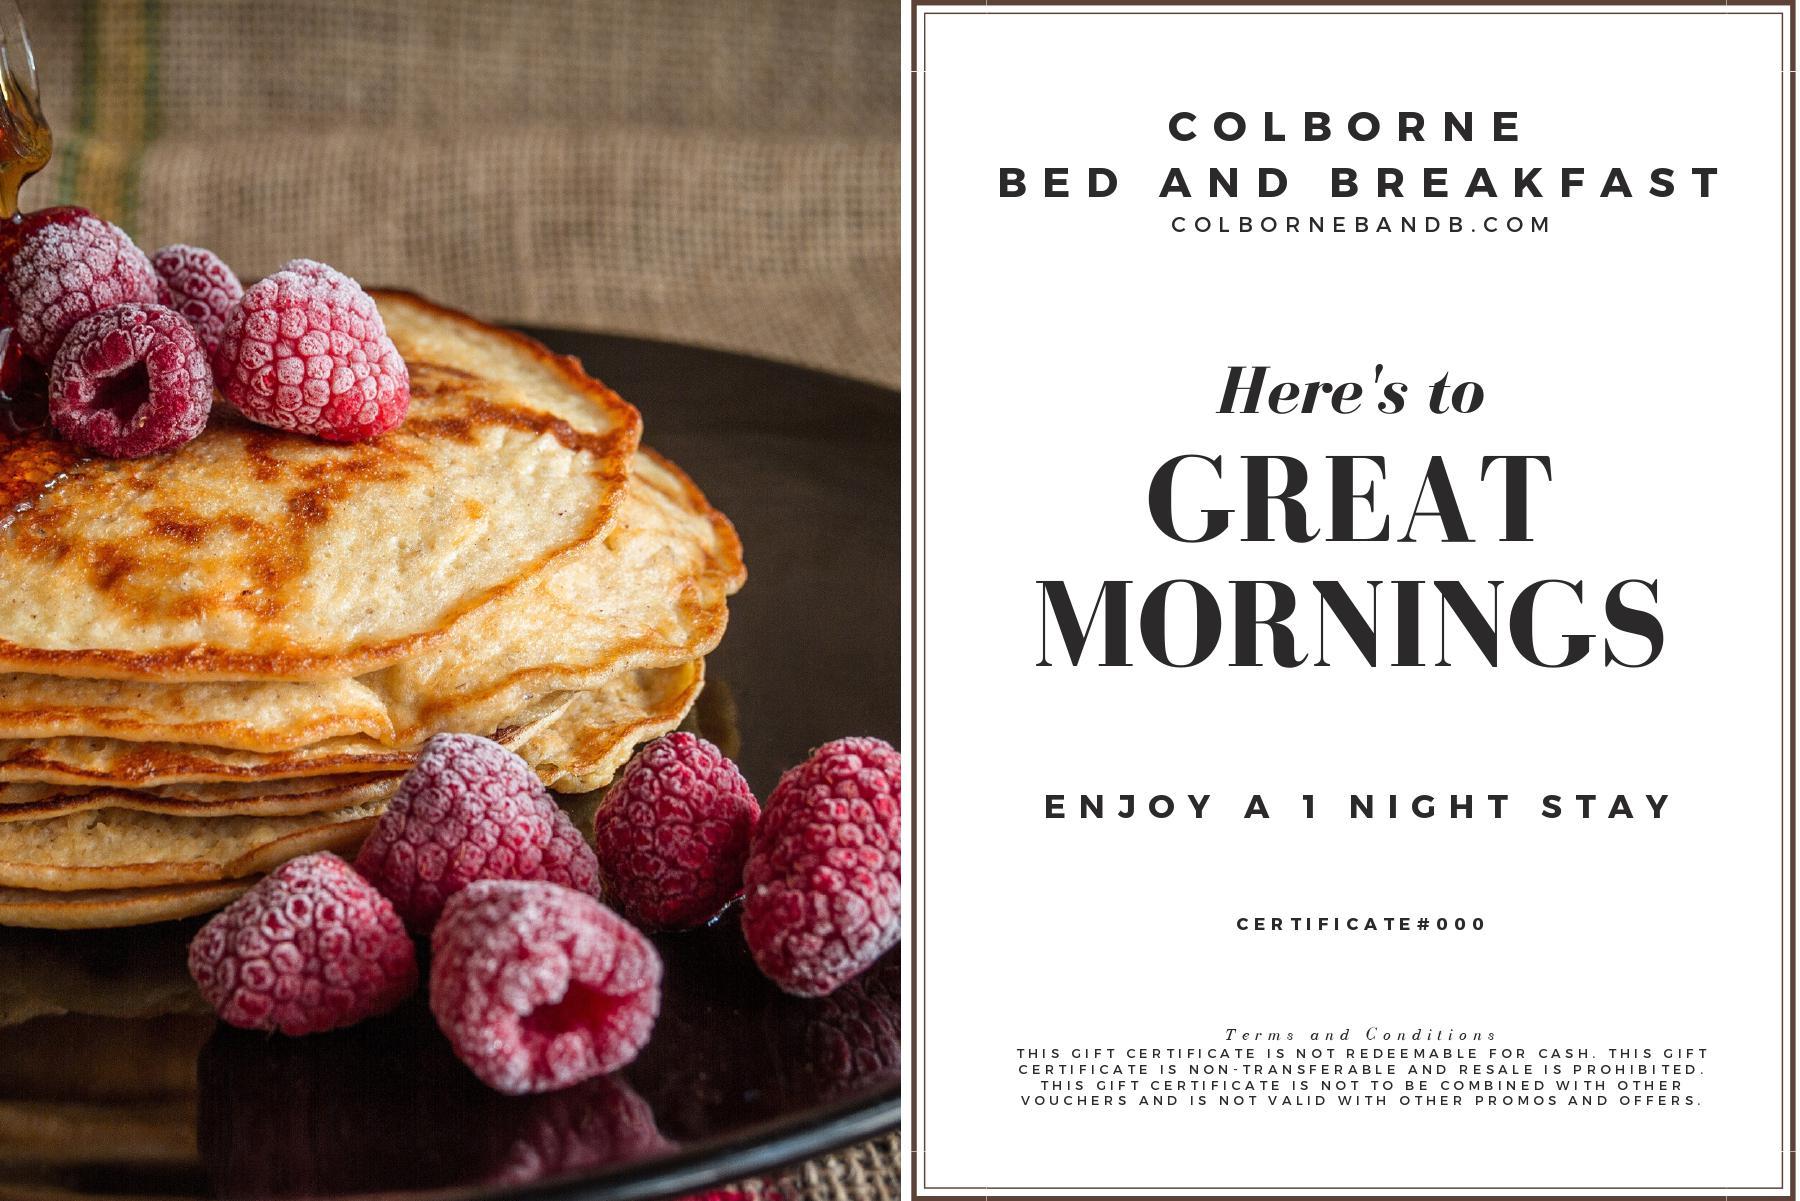 Gift Certificate (Colborne Bed & Breakfast) Image